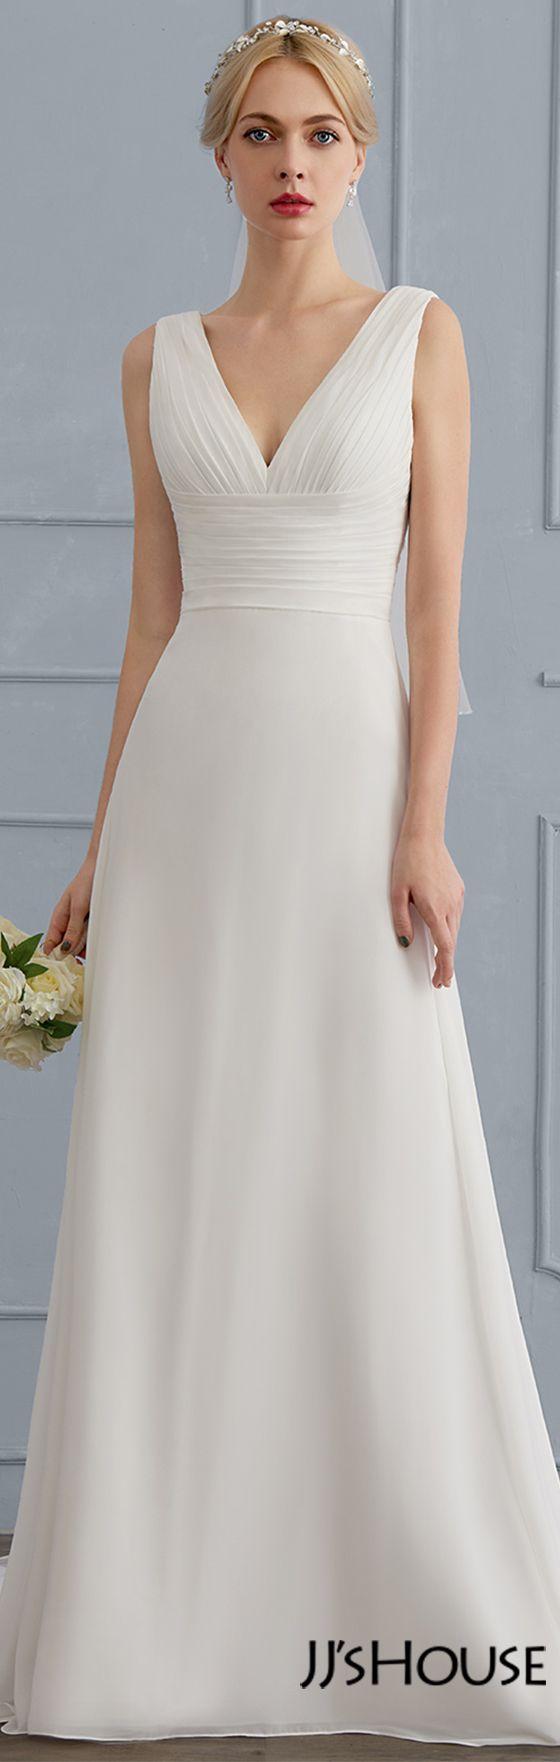 Jjshouse wedding dresses wedding dresses pinterest wedding